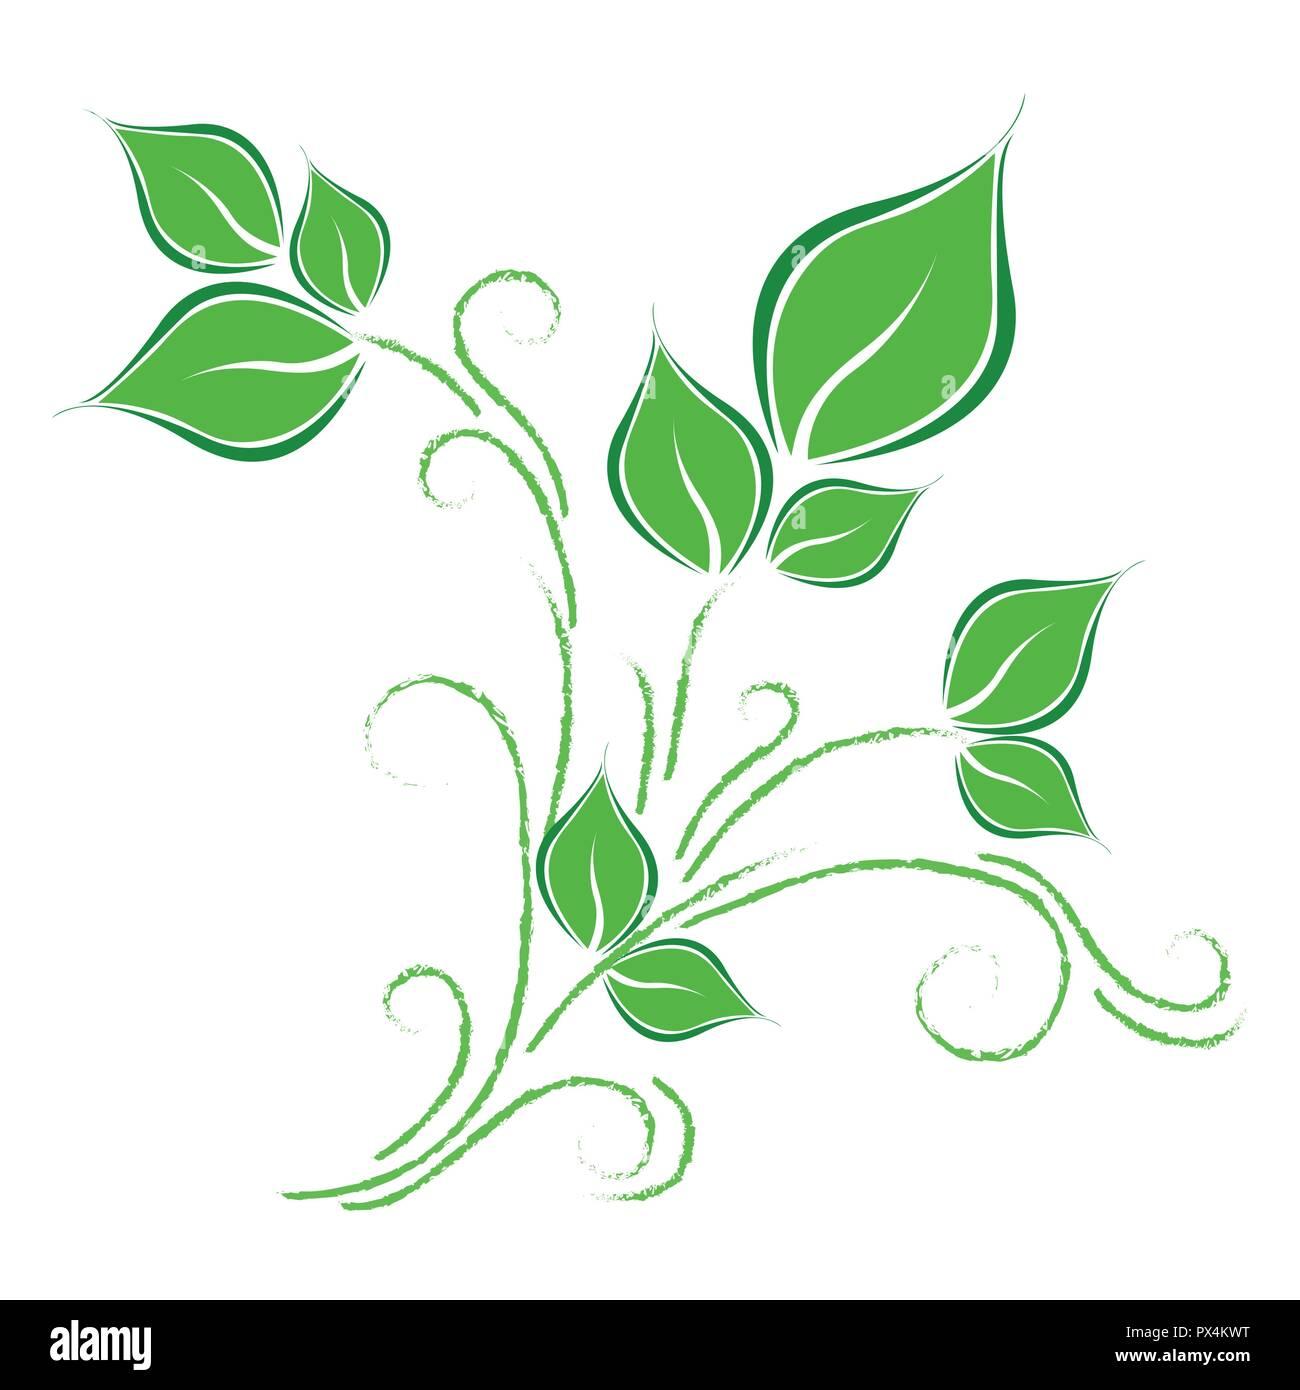 Grüne Blätter Ranke auf weißem Hintergrund Vektor-illustration EPS 10. Stockbild